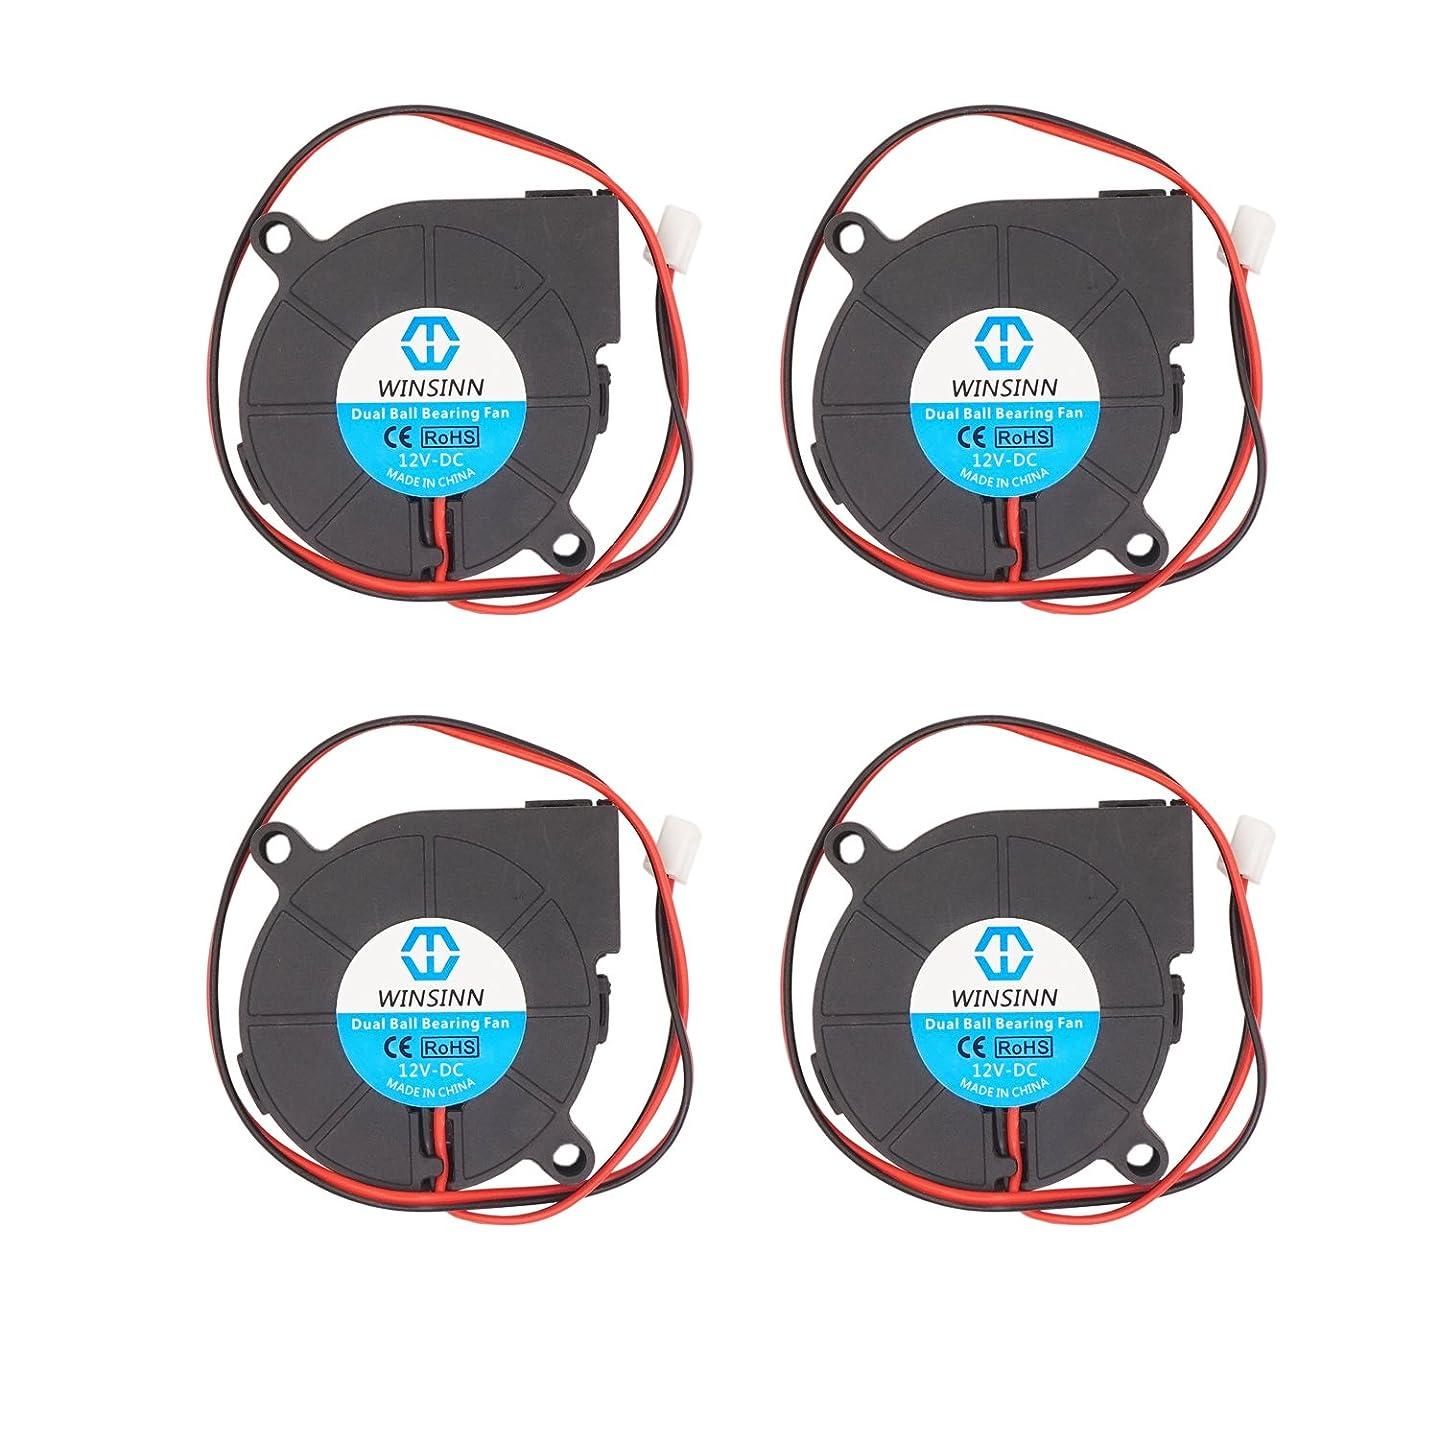 WINSINN Blower Fan 12V 50mm 50x15mm 5015 DC Brushless Cooling Dual Ball Bearing For 3D Printer Extruder Hotend Makerbot MK7 MK8 CPU Chip Arduino - 2Pin 0.28A 3.36W 6000+-5% RPM (Pack of 4Pcs)